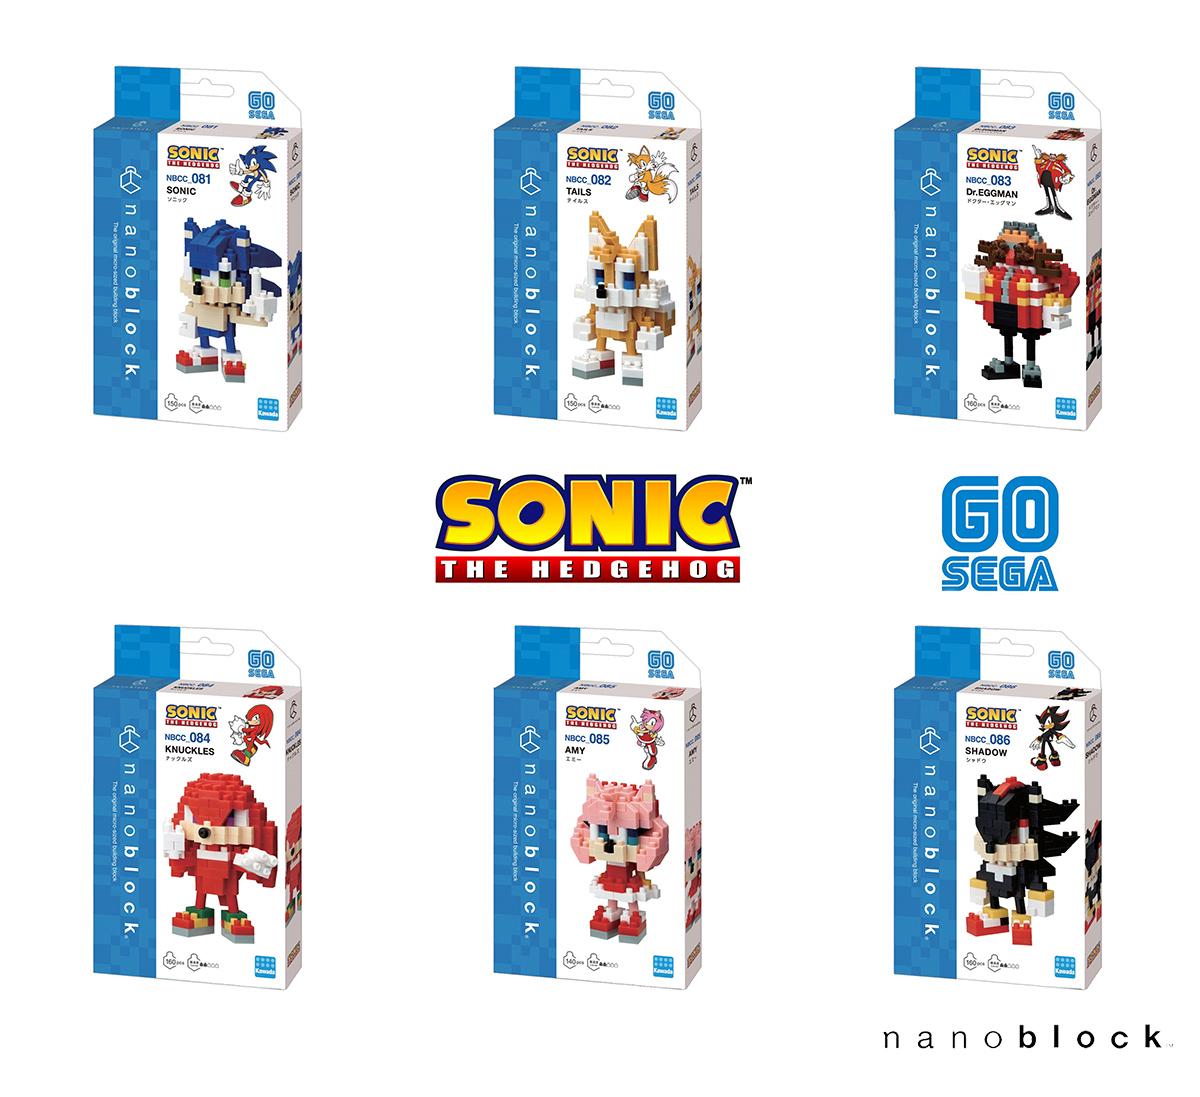 Nanoblock Sonic the Hedgehog Collection